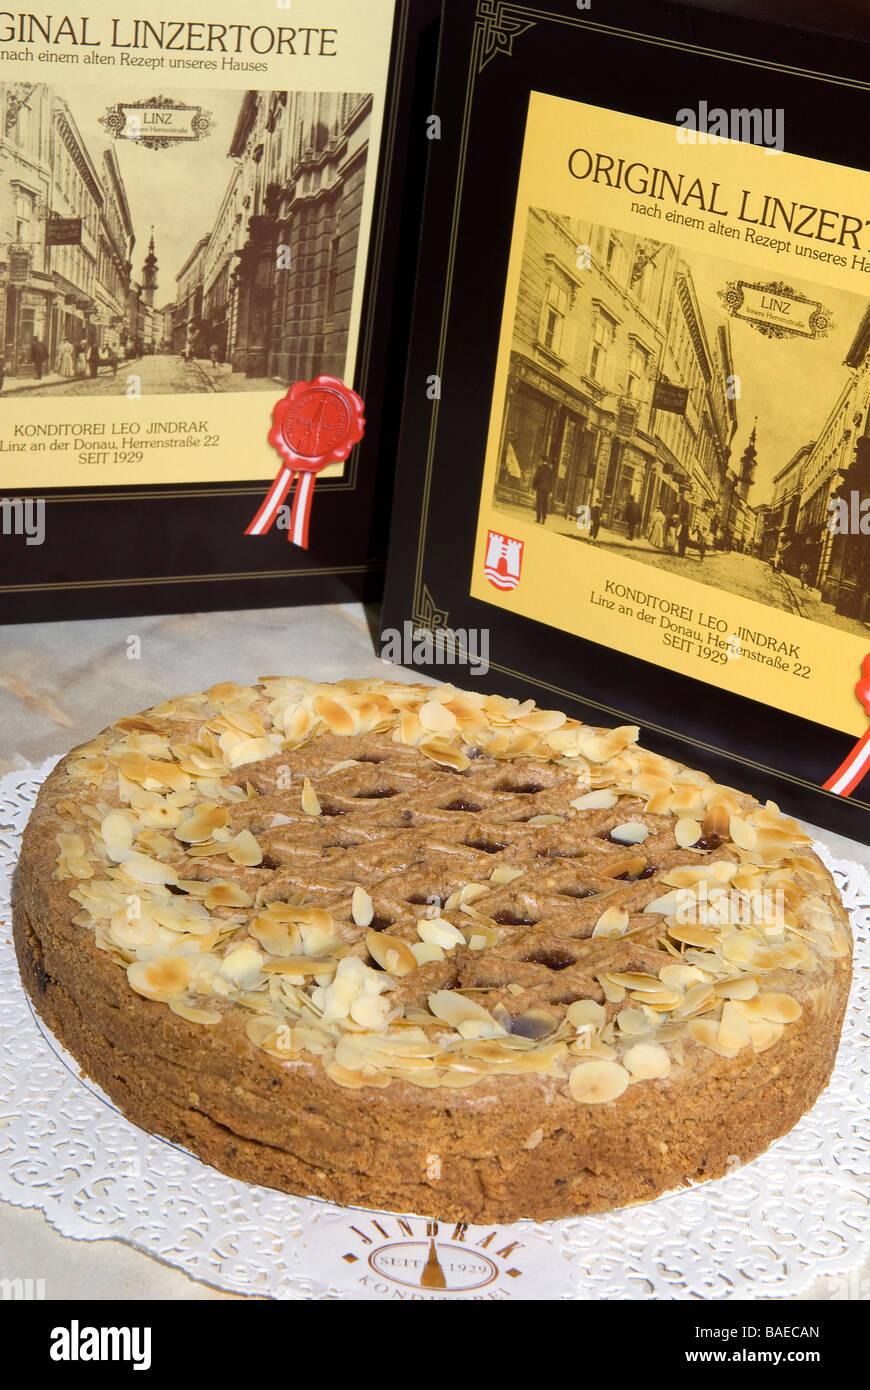 Austria Linz Jindrak cafe and pastry Herrenstrasse 22